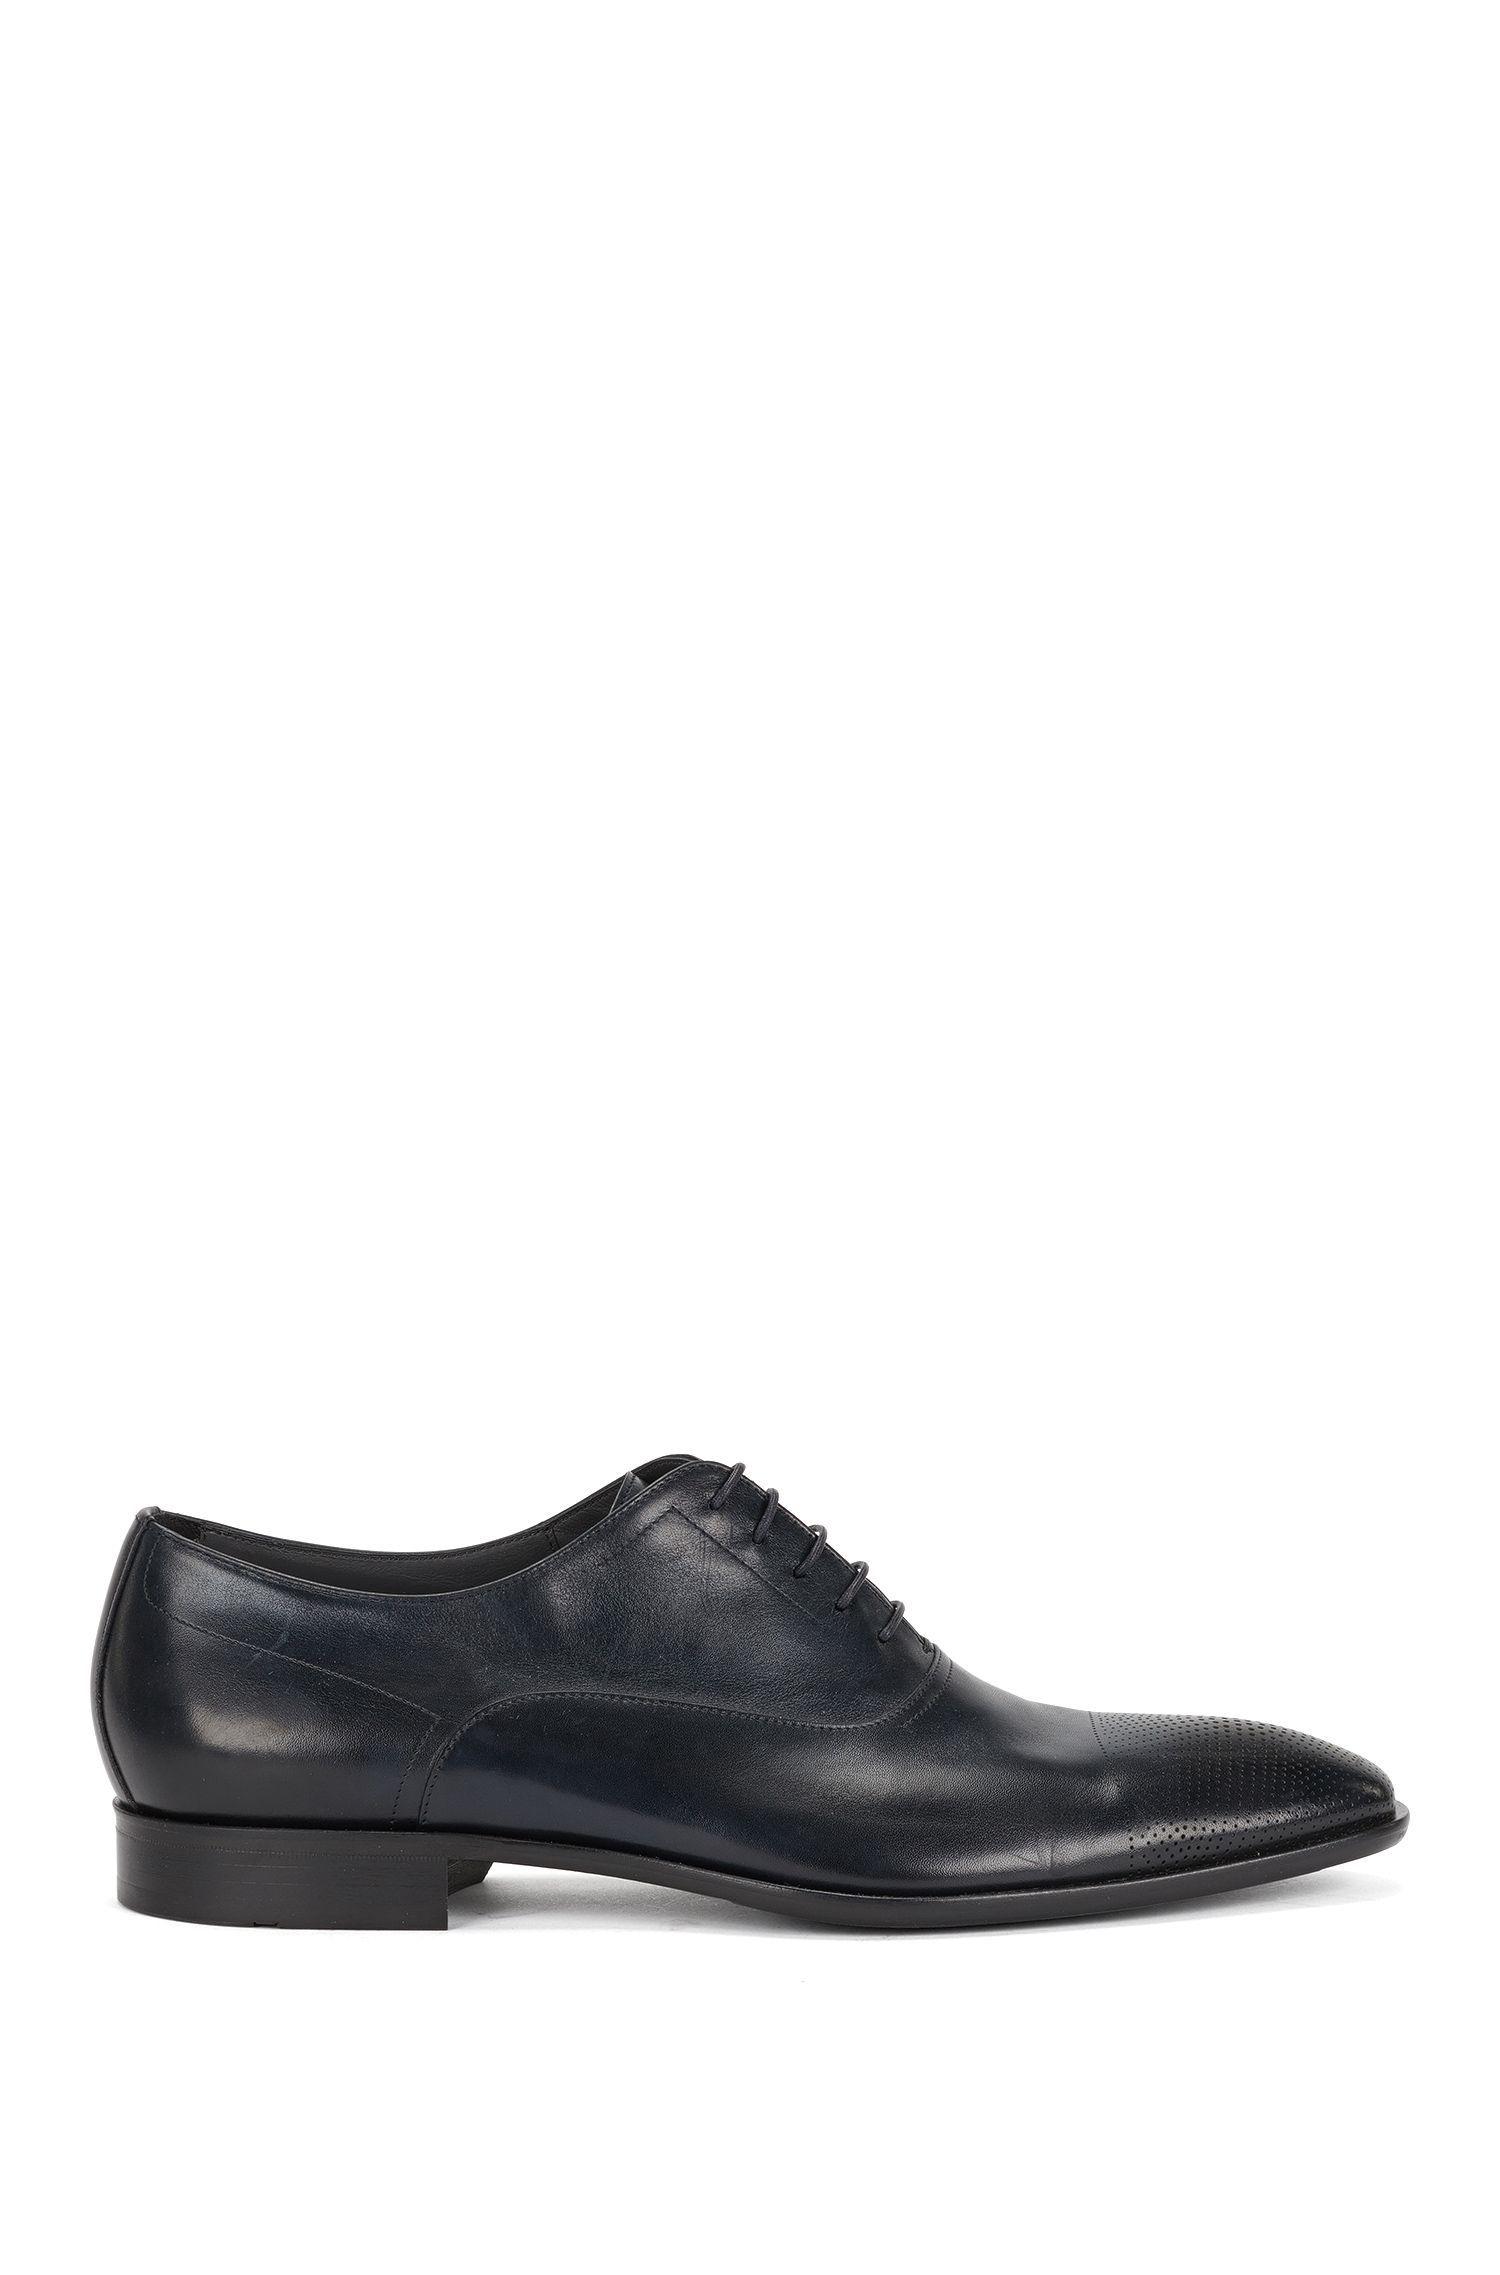 'Chelsea Oxfr ltct' | Italian Leather Oxford Dress Shoes